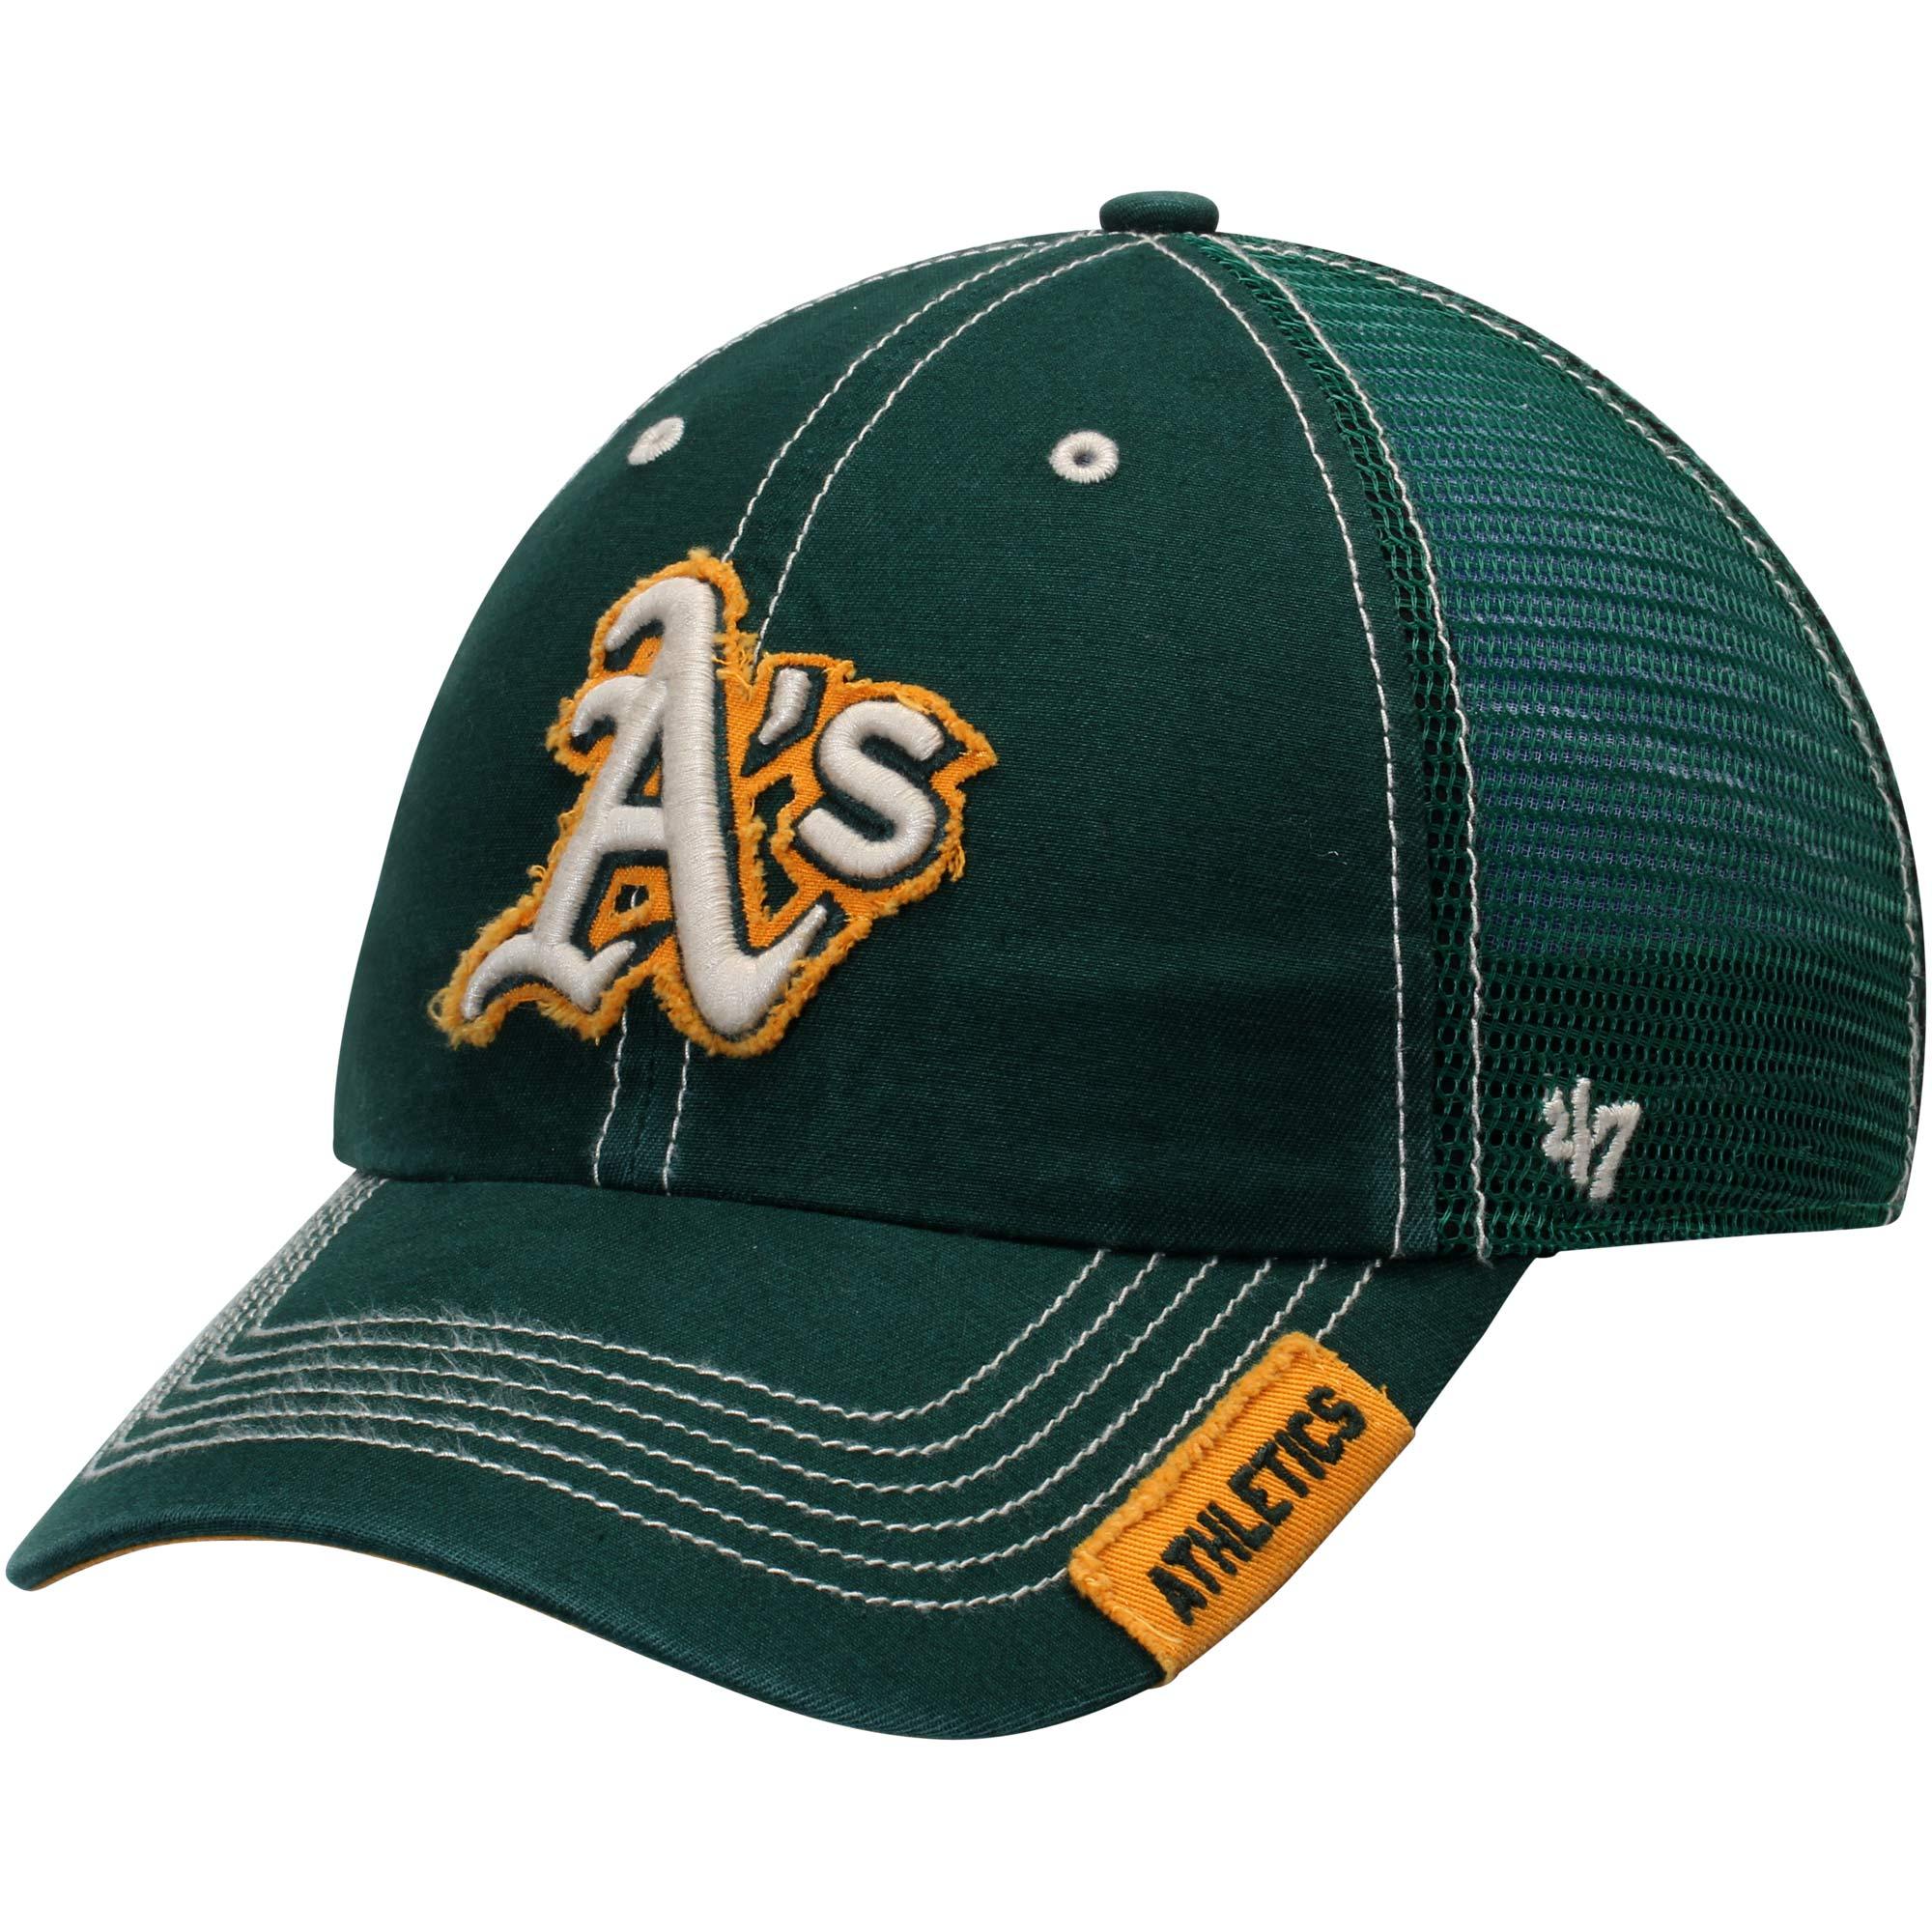 Oakland Athletics '47 Turner Clean-Up Adjustable Hat - Green - OSFA